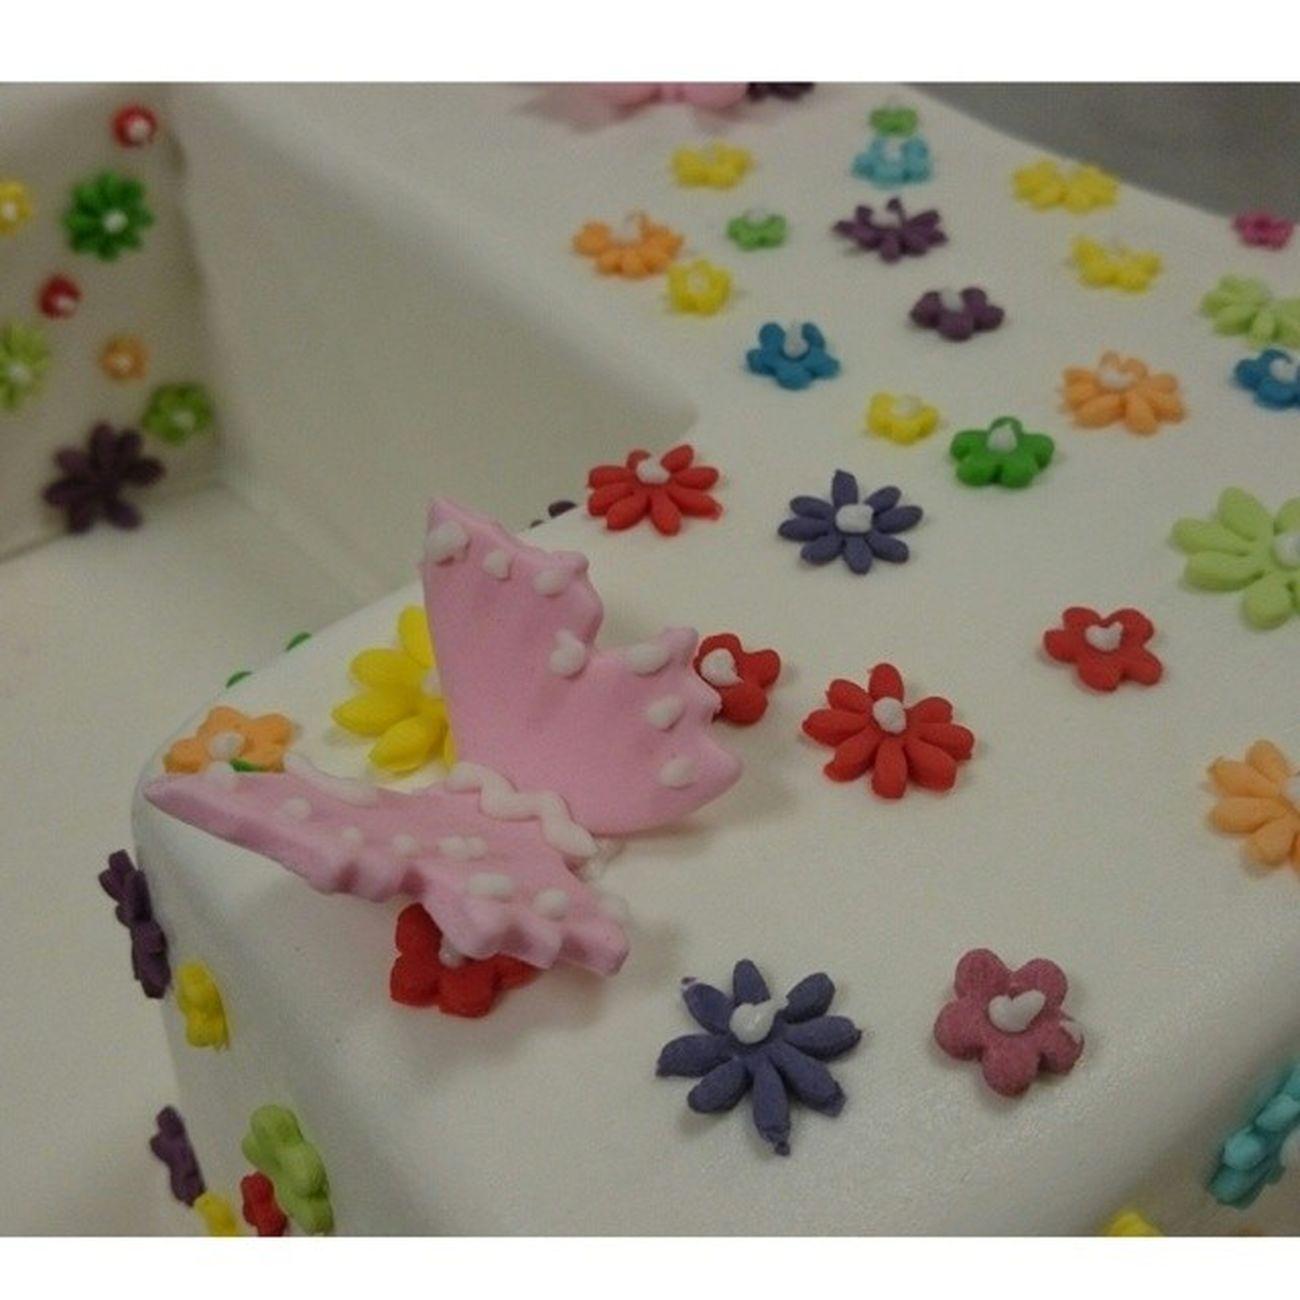 Biri pasta mı istedi? :))